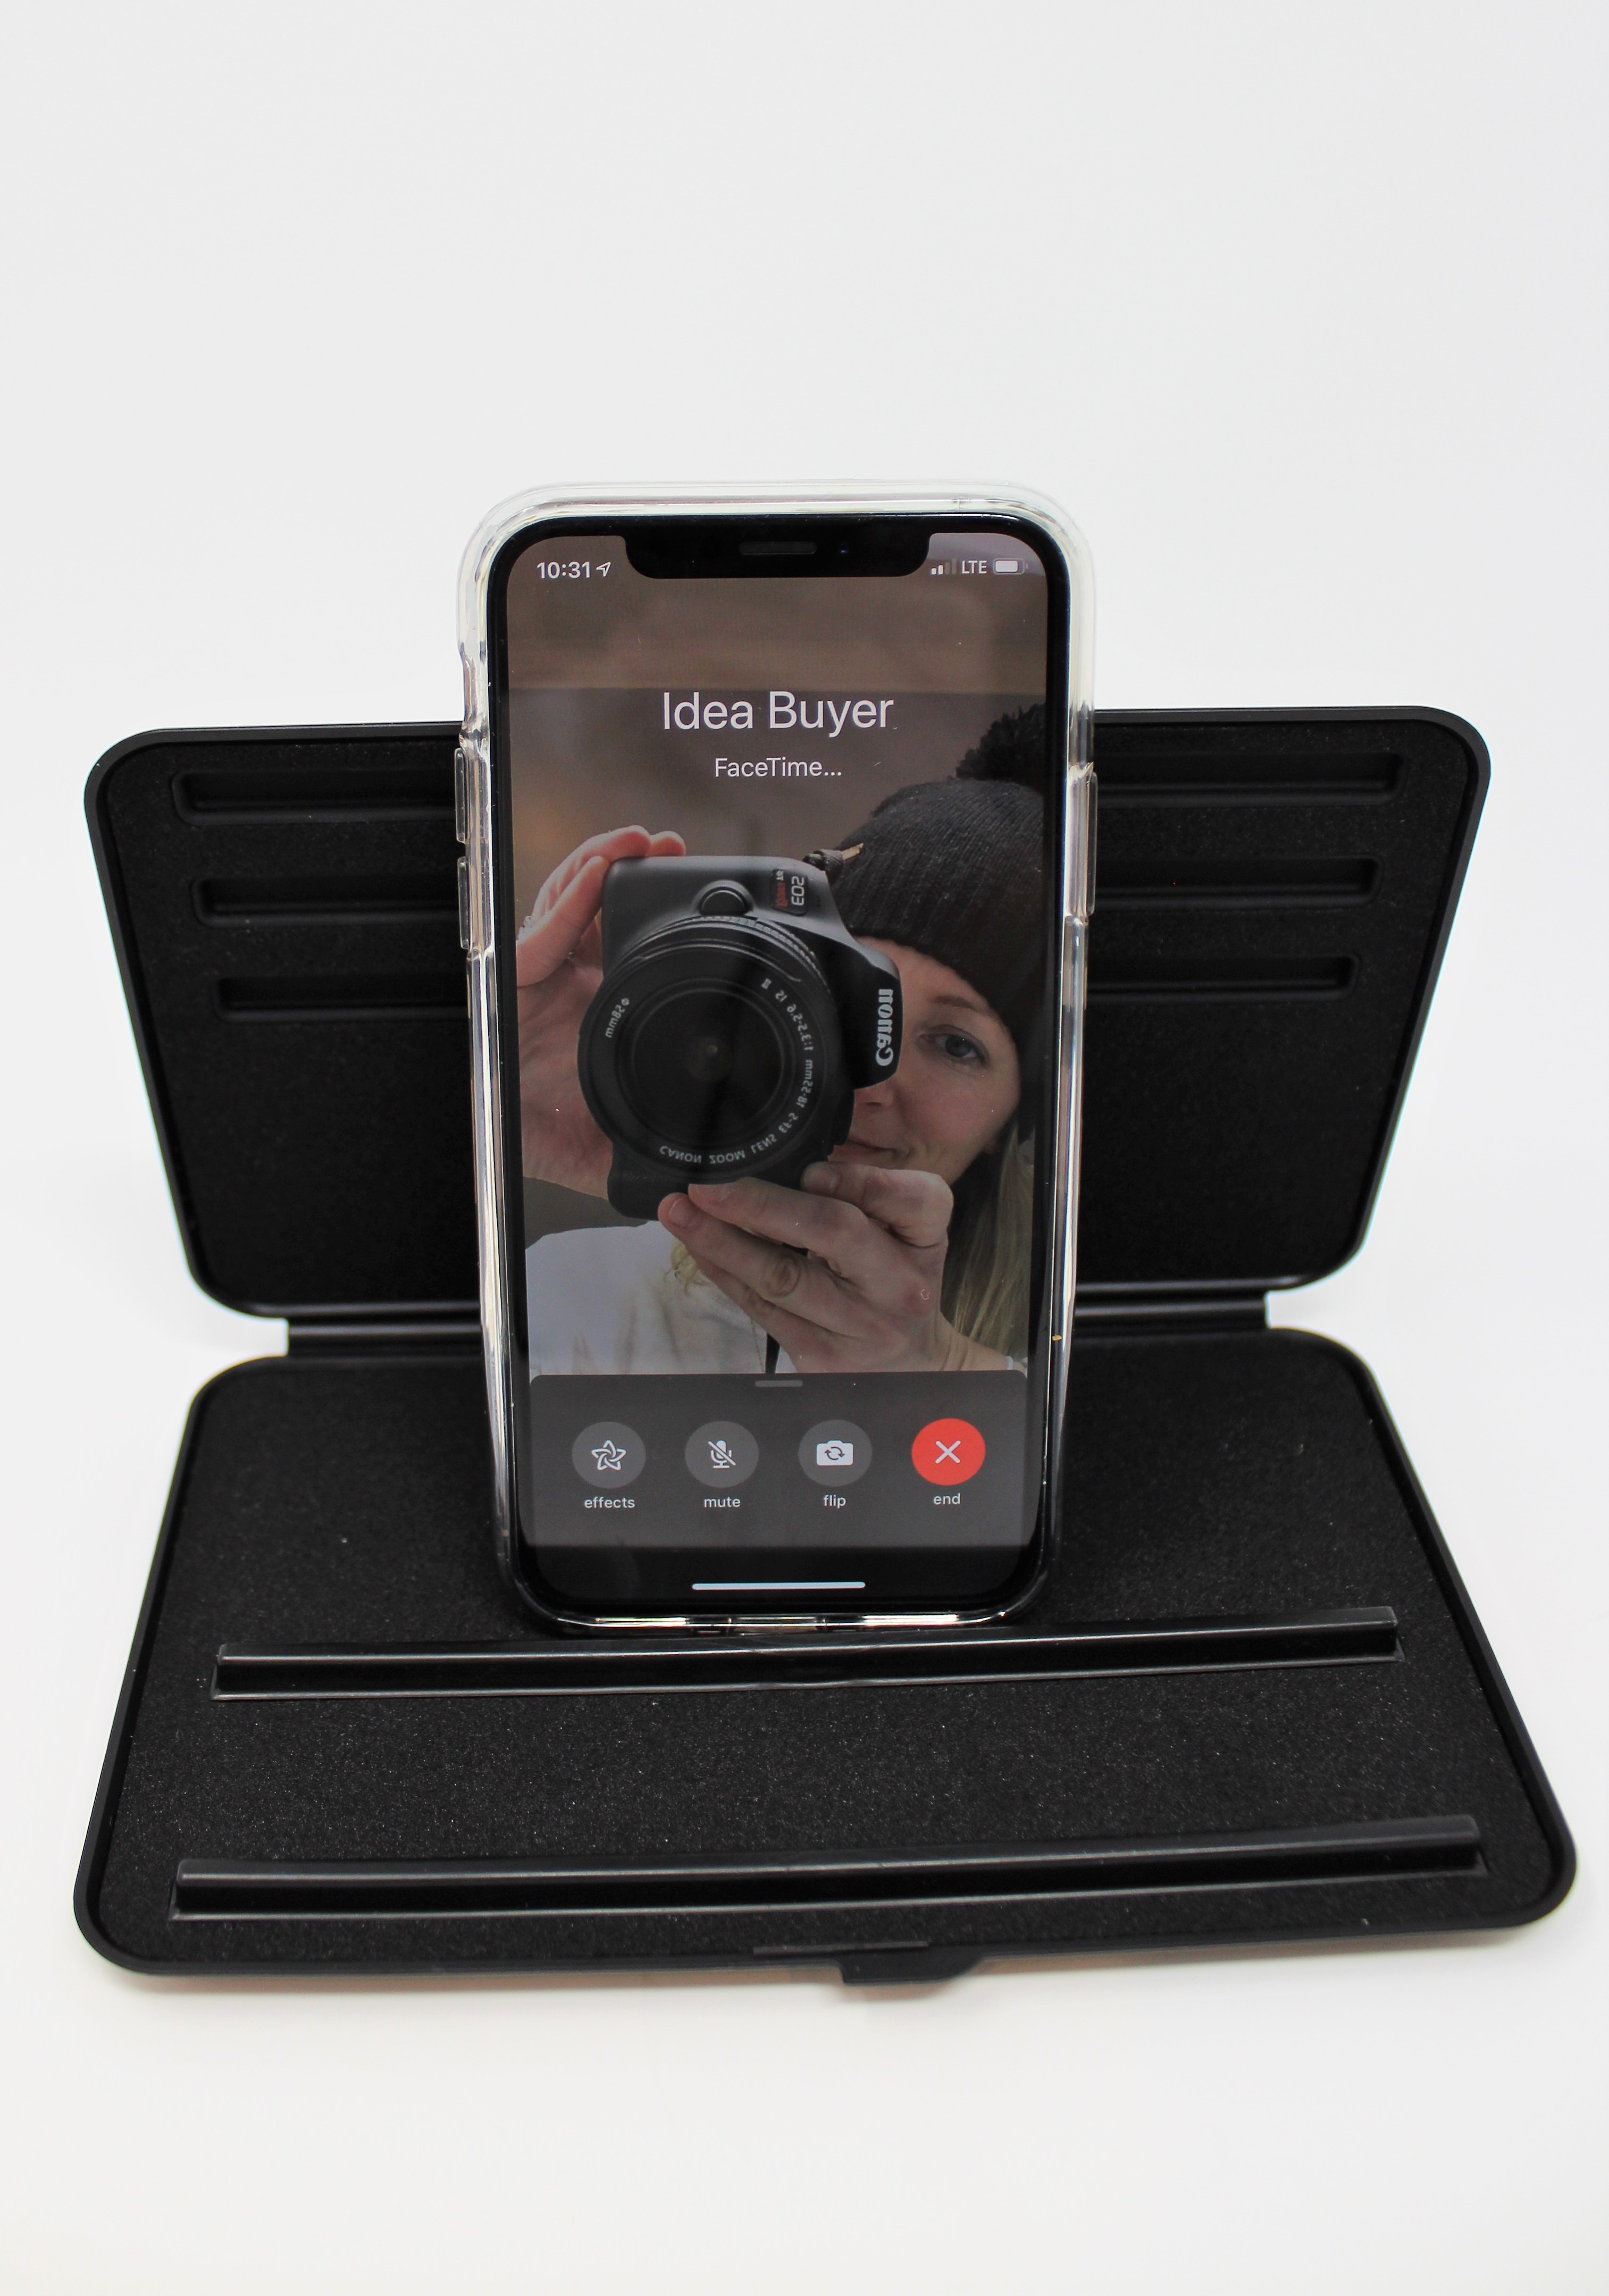 Idea Buyer Product Photo Phone Throne Whitebox Facetime